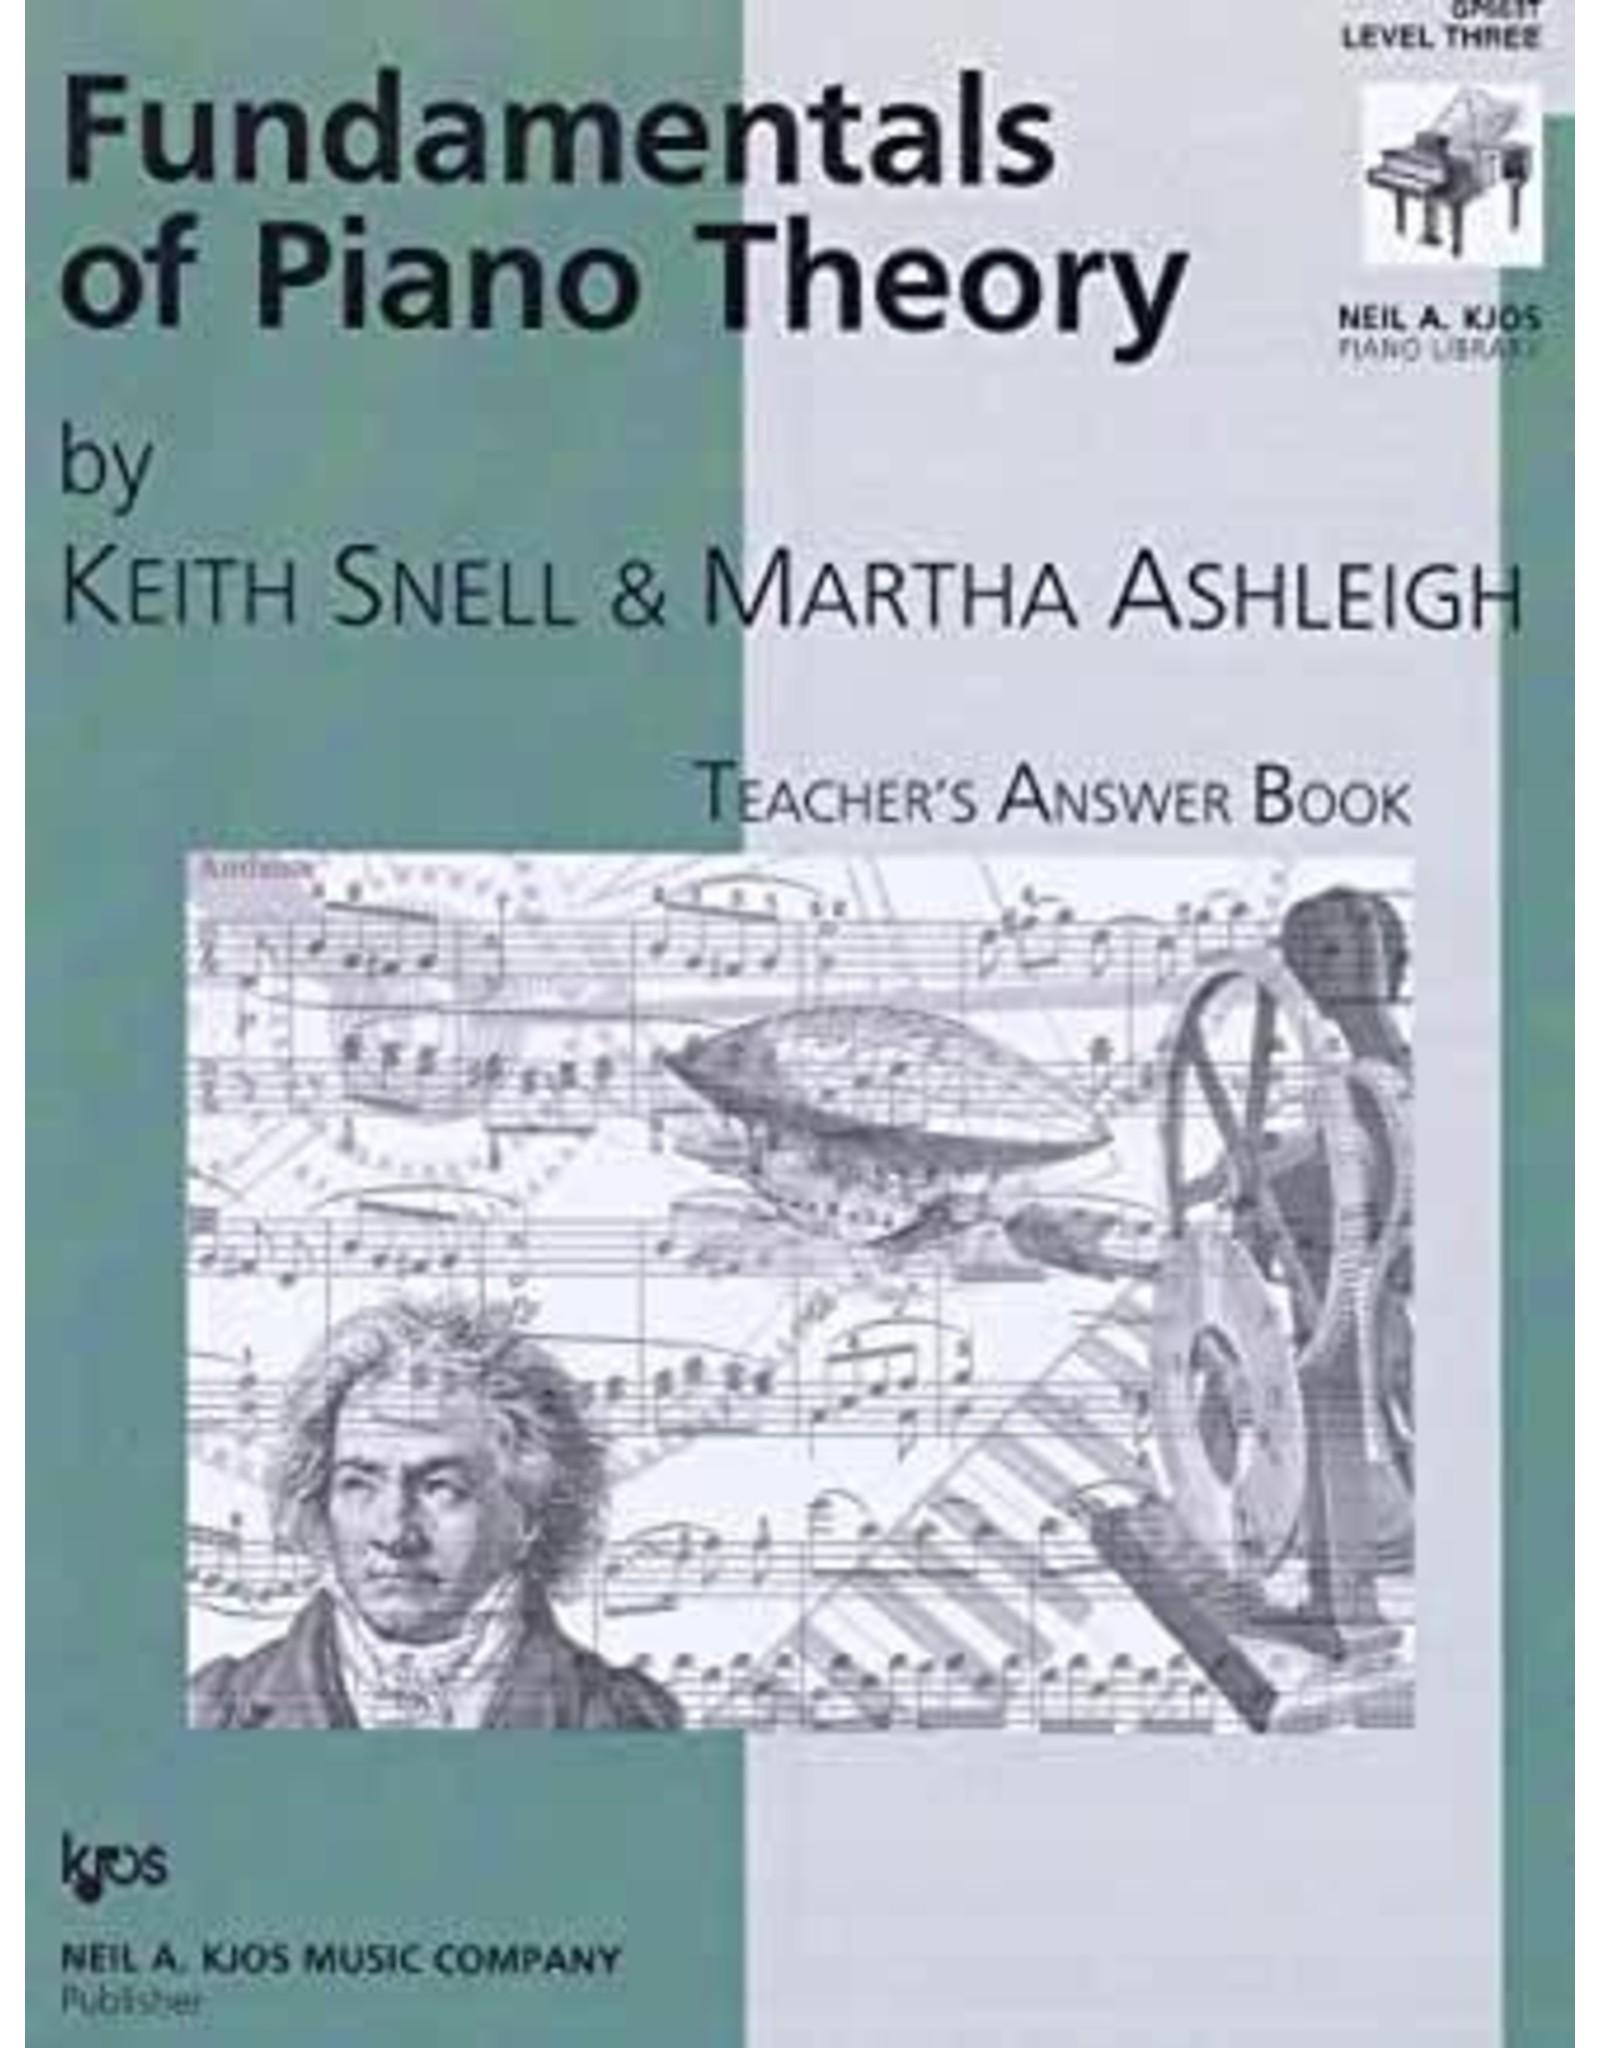 Kjos Fundamentals of Piano Theory, Level 3 Answer Book